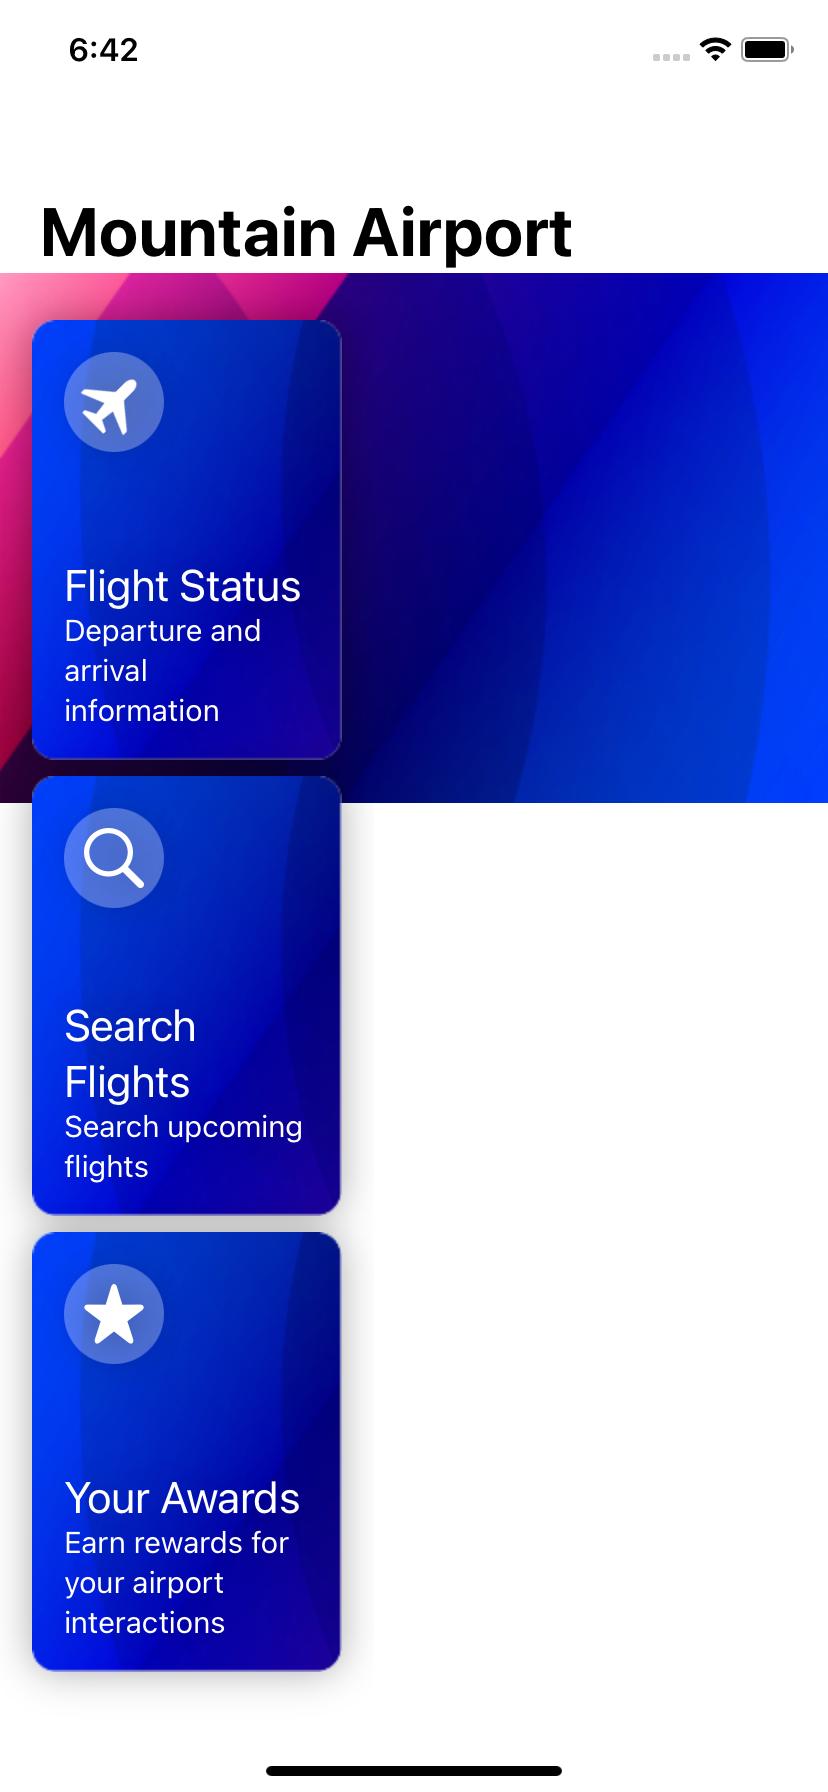 Mountain Airport app initial screen